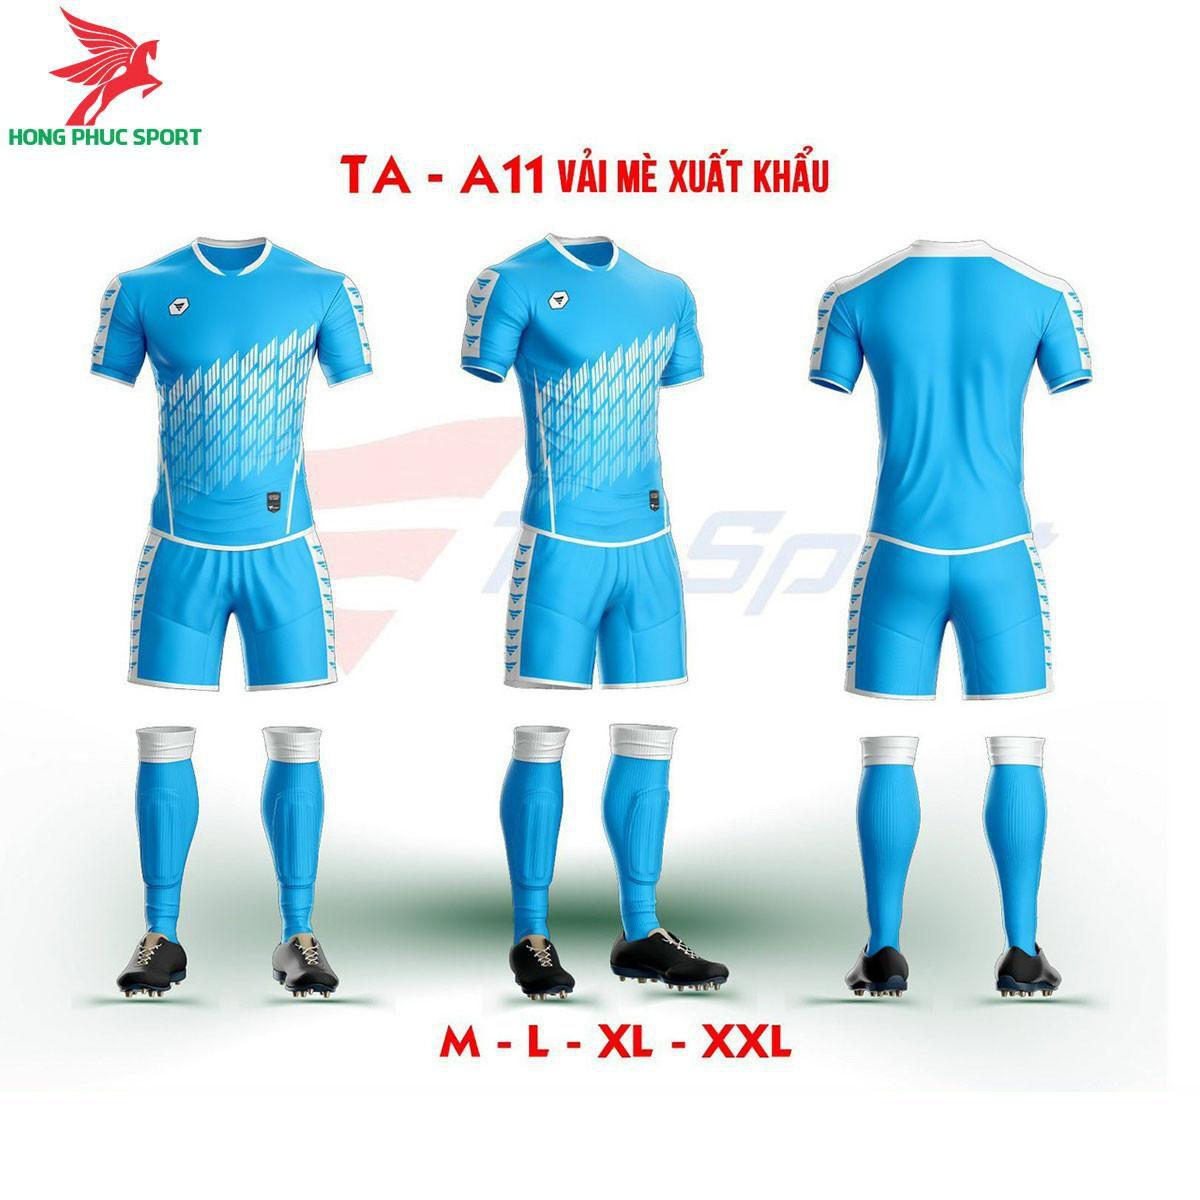 https://cdn.hongphucsport.com/unsafe/s4.shopbay.vn/files/285/ao-khong-logo-truong-an-ta-a11-mau-xanh-6047432bca88c.jpg